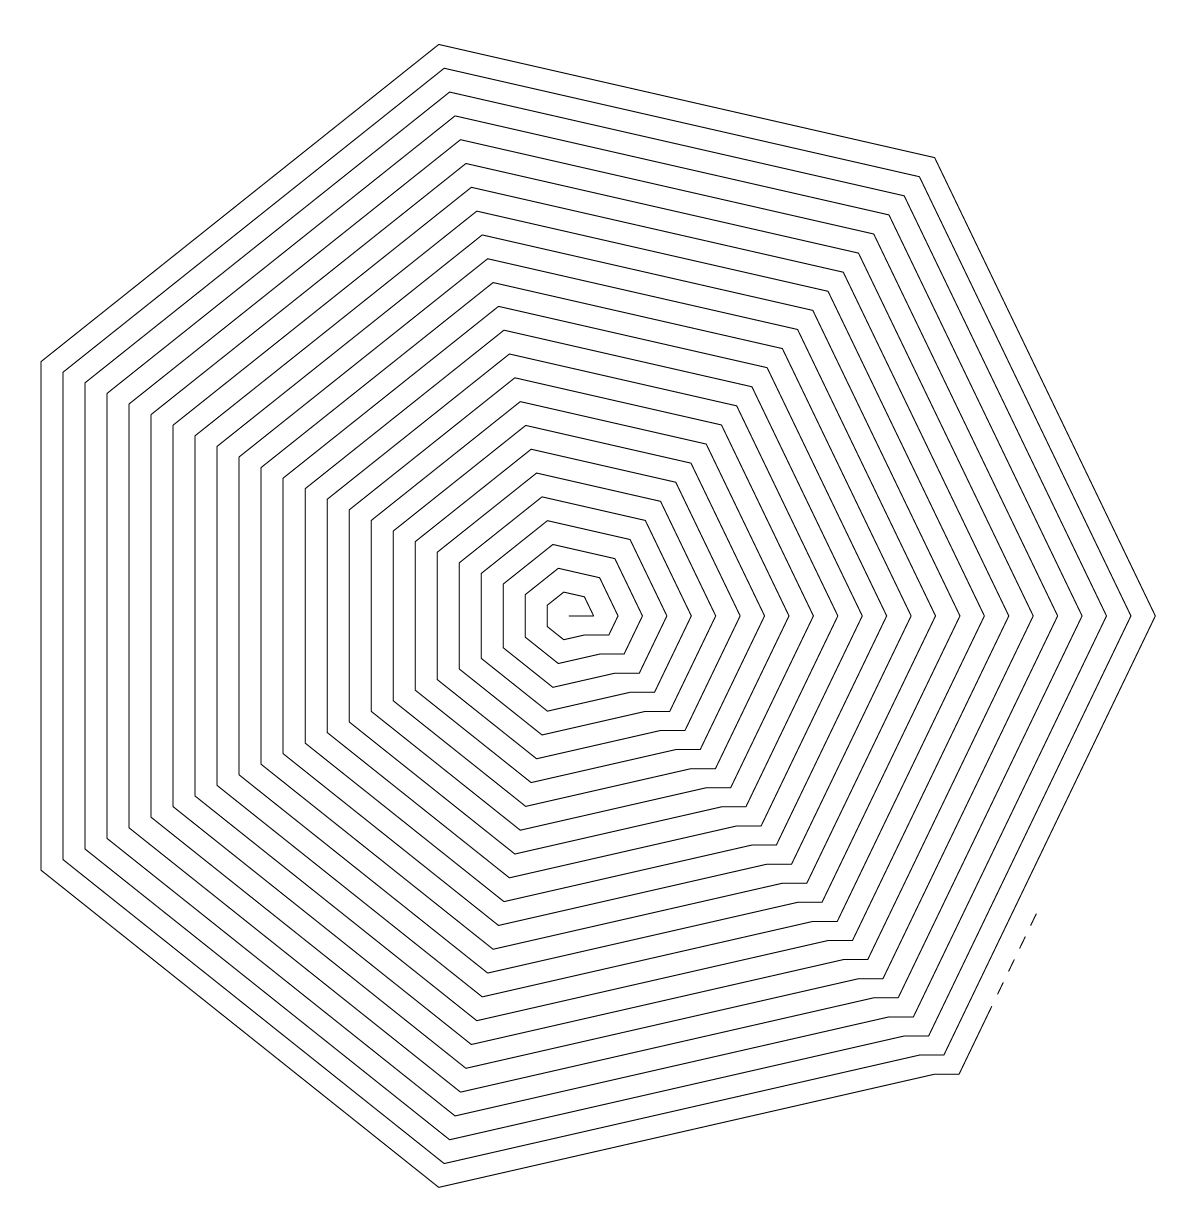 Heptagonal-spiral-layer6